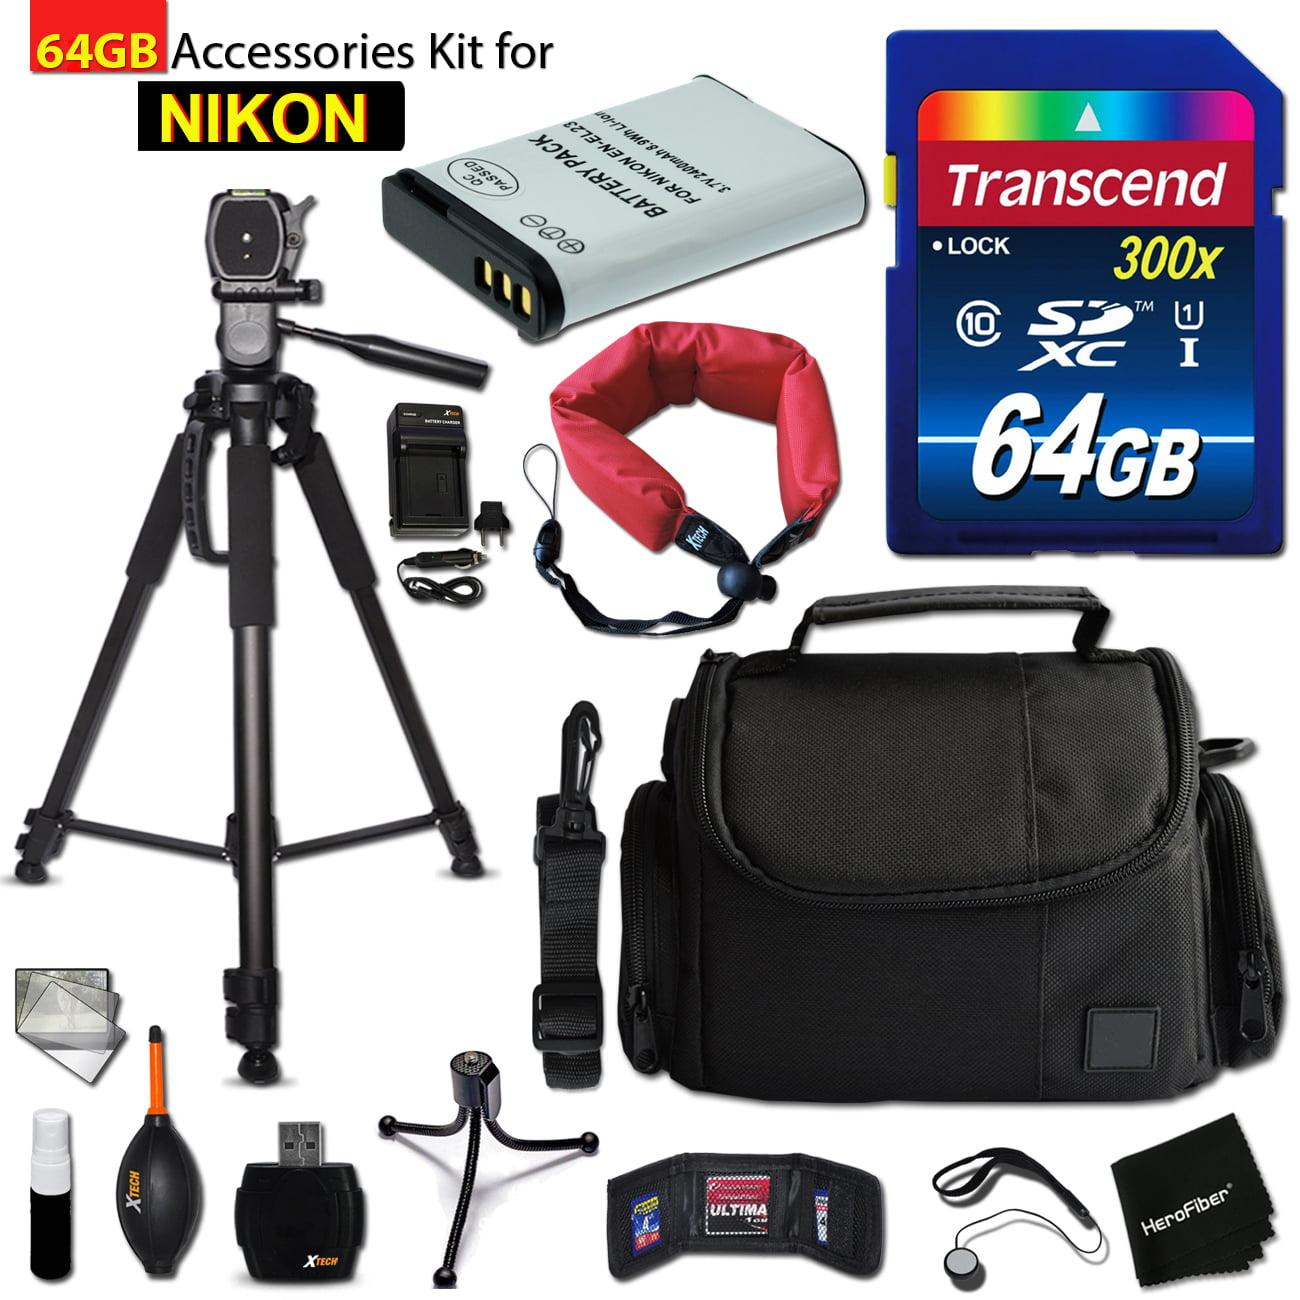 64GB Accessory Kit for Nikon CoolPix B700, P900, P610, P6...